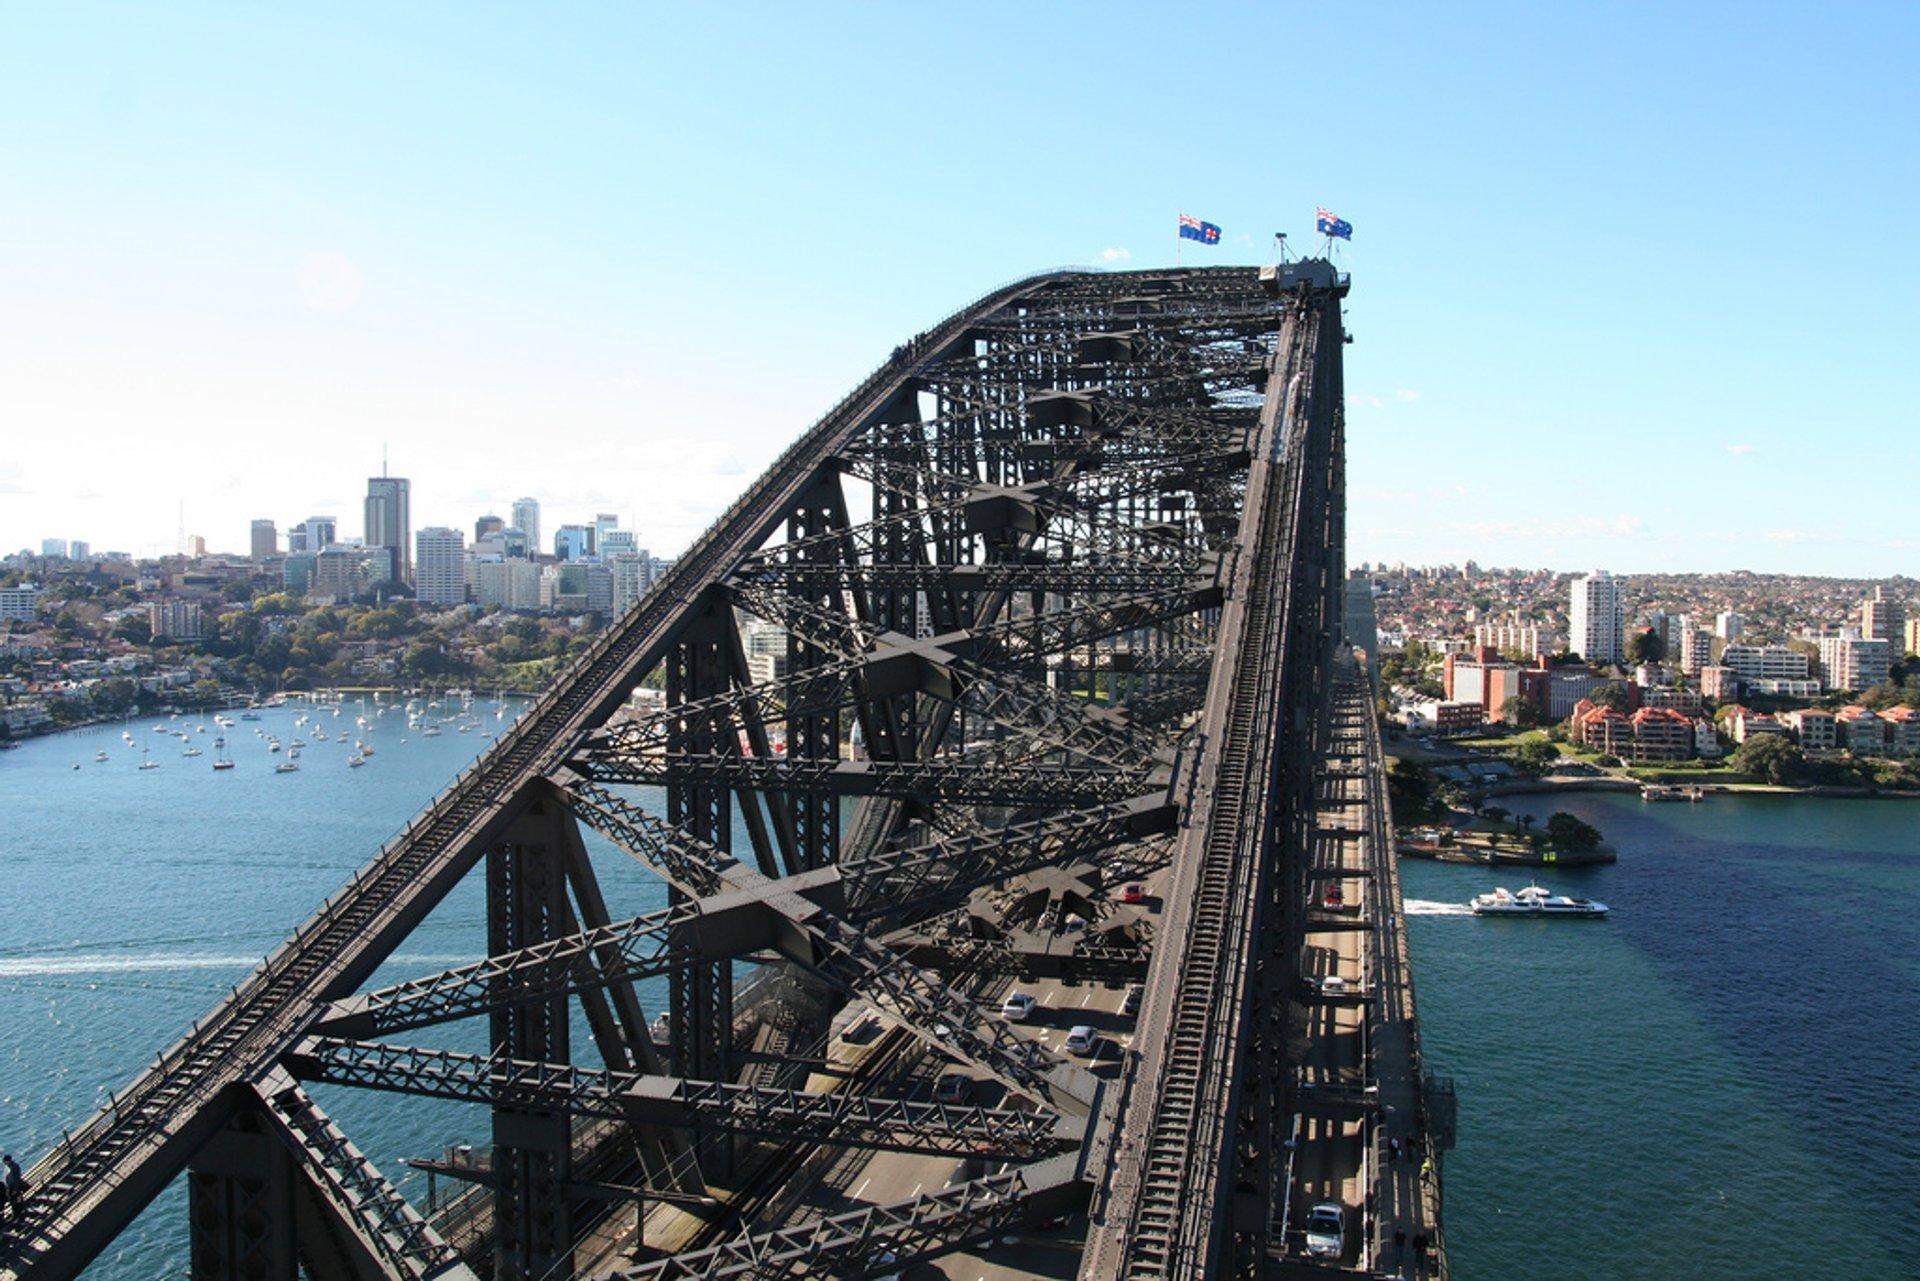 Sydney Harbour Bridge Climb in Sydney 2020 - Best Time